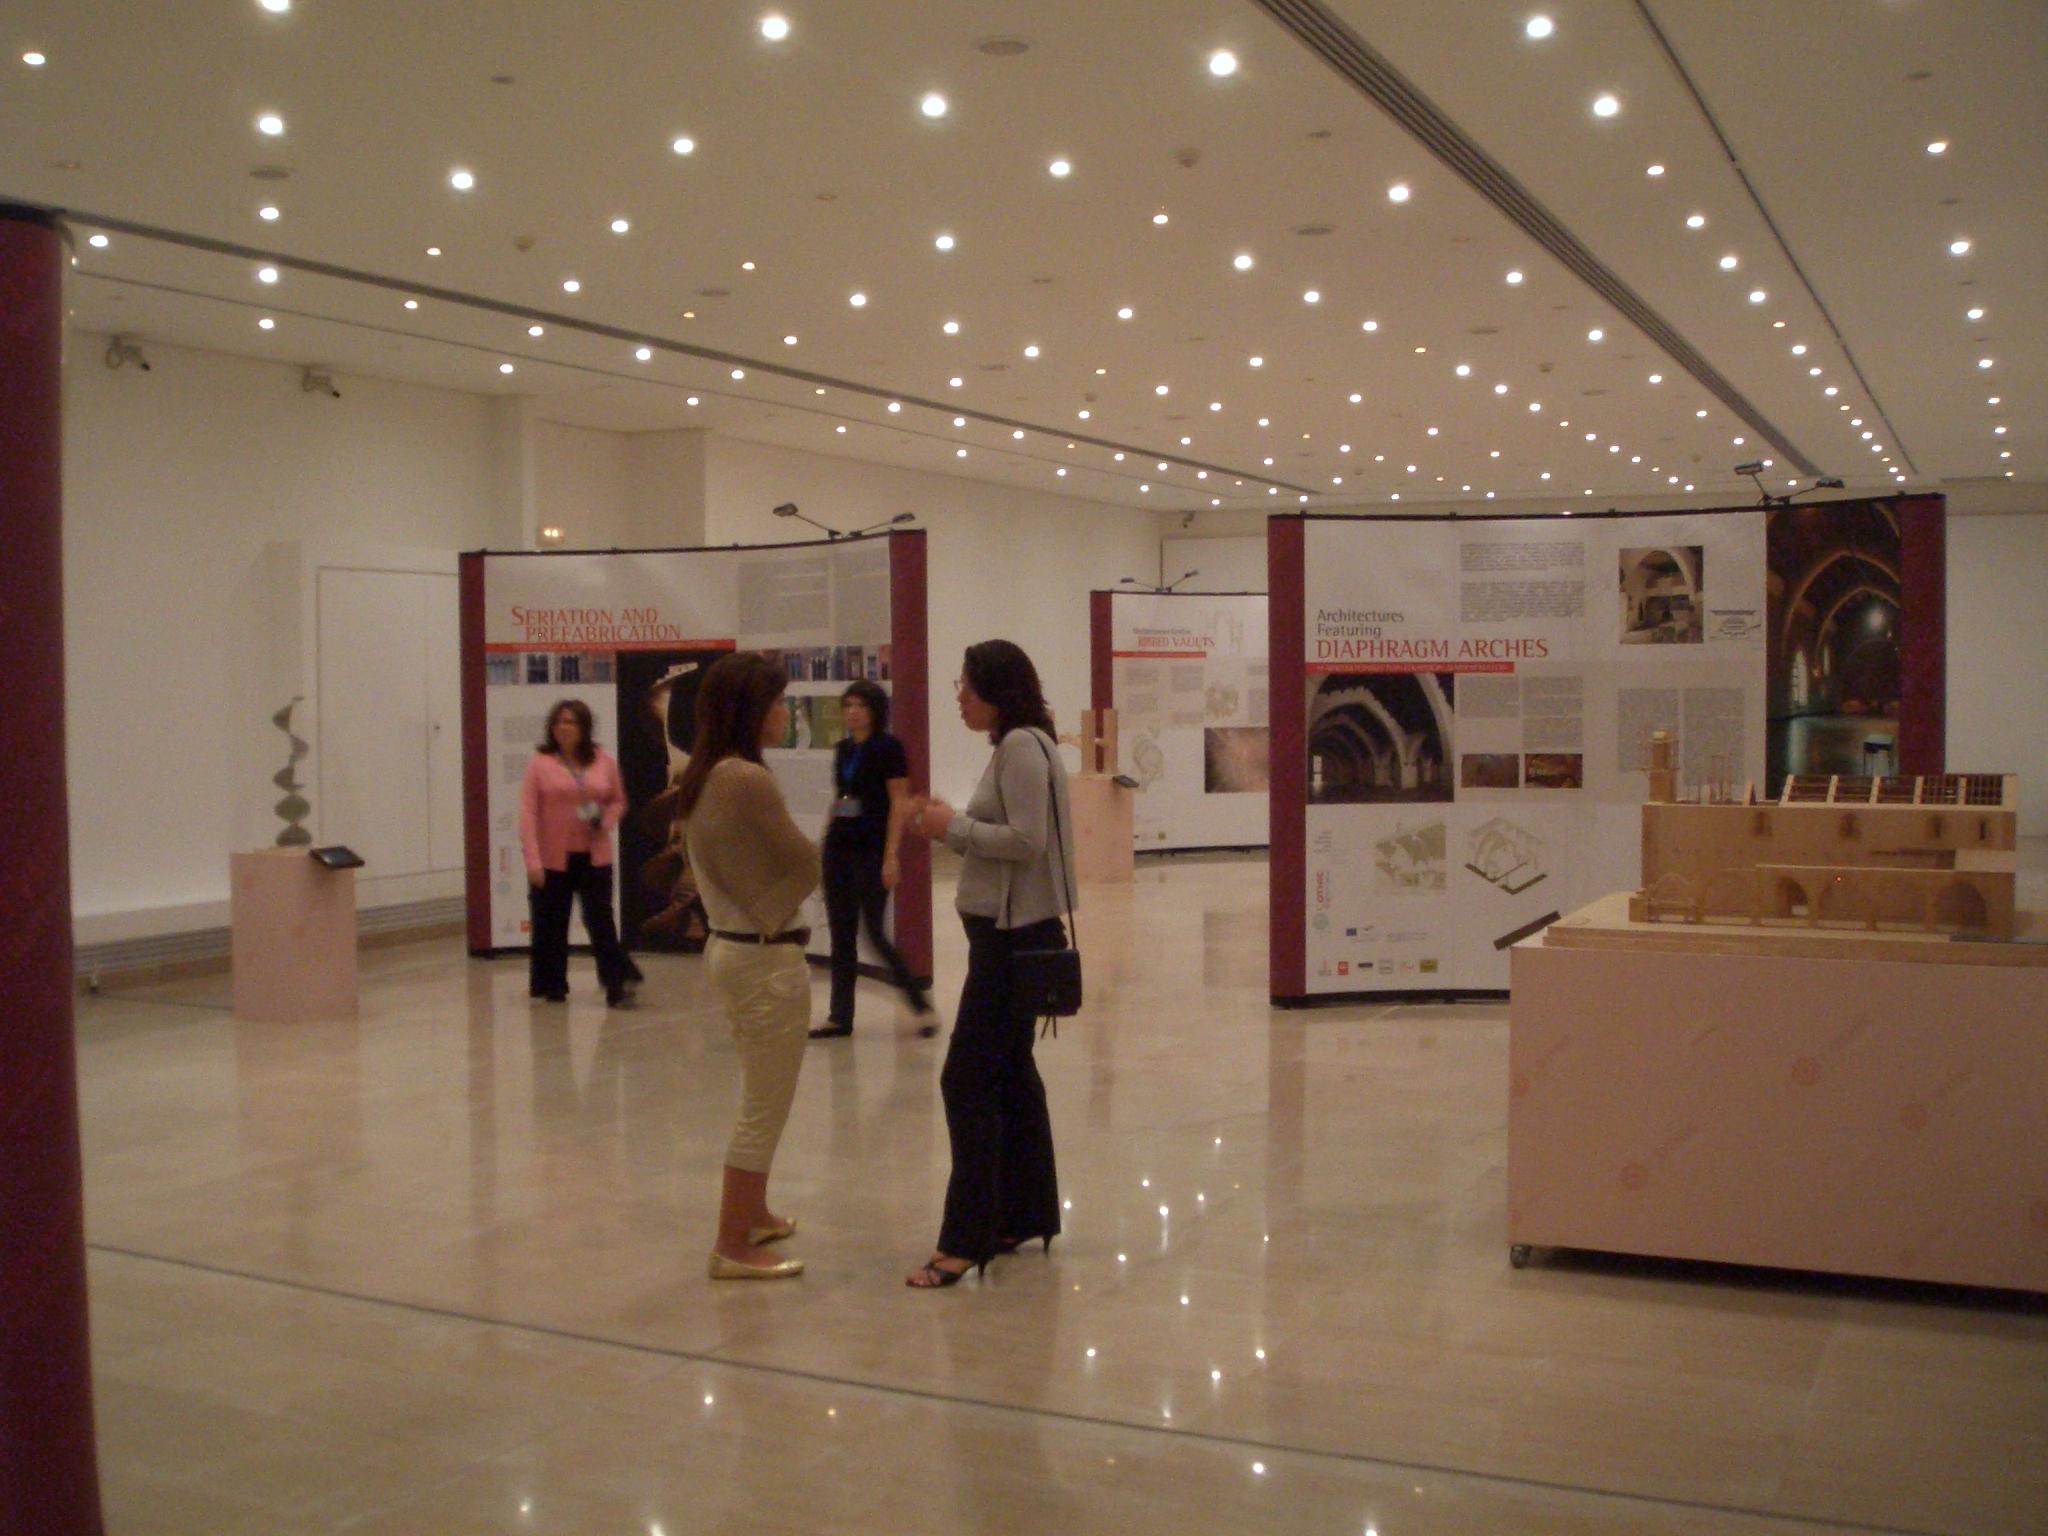 D Coform Exhibition : Travelling exhibition